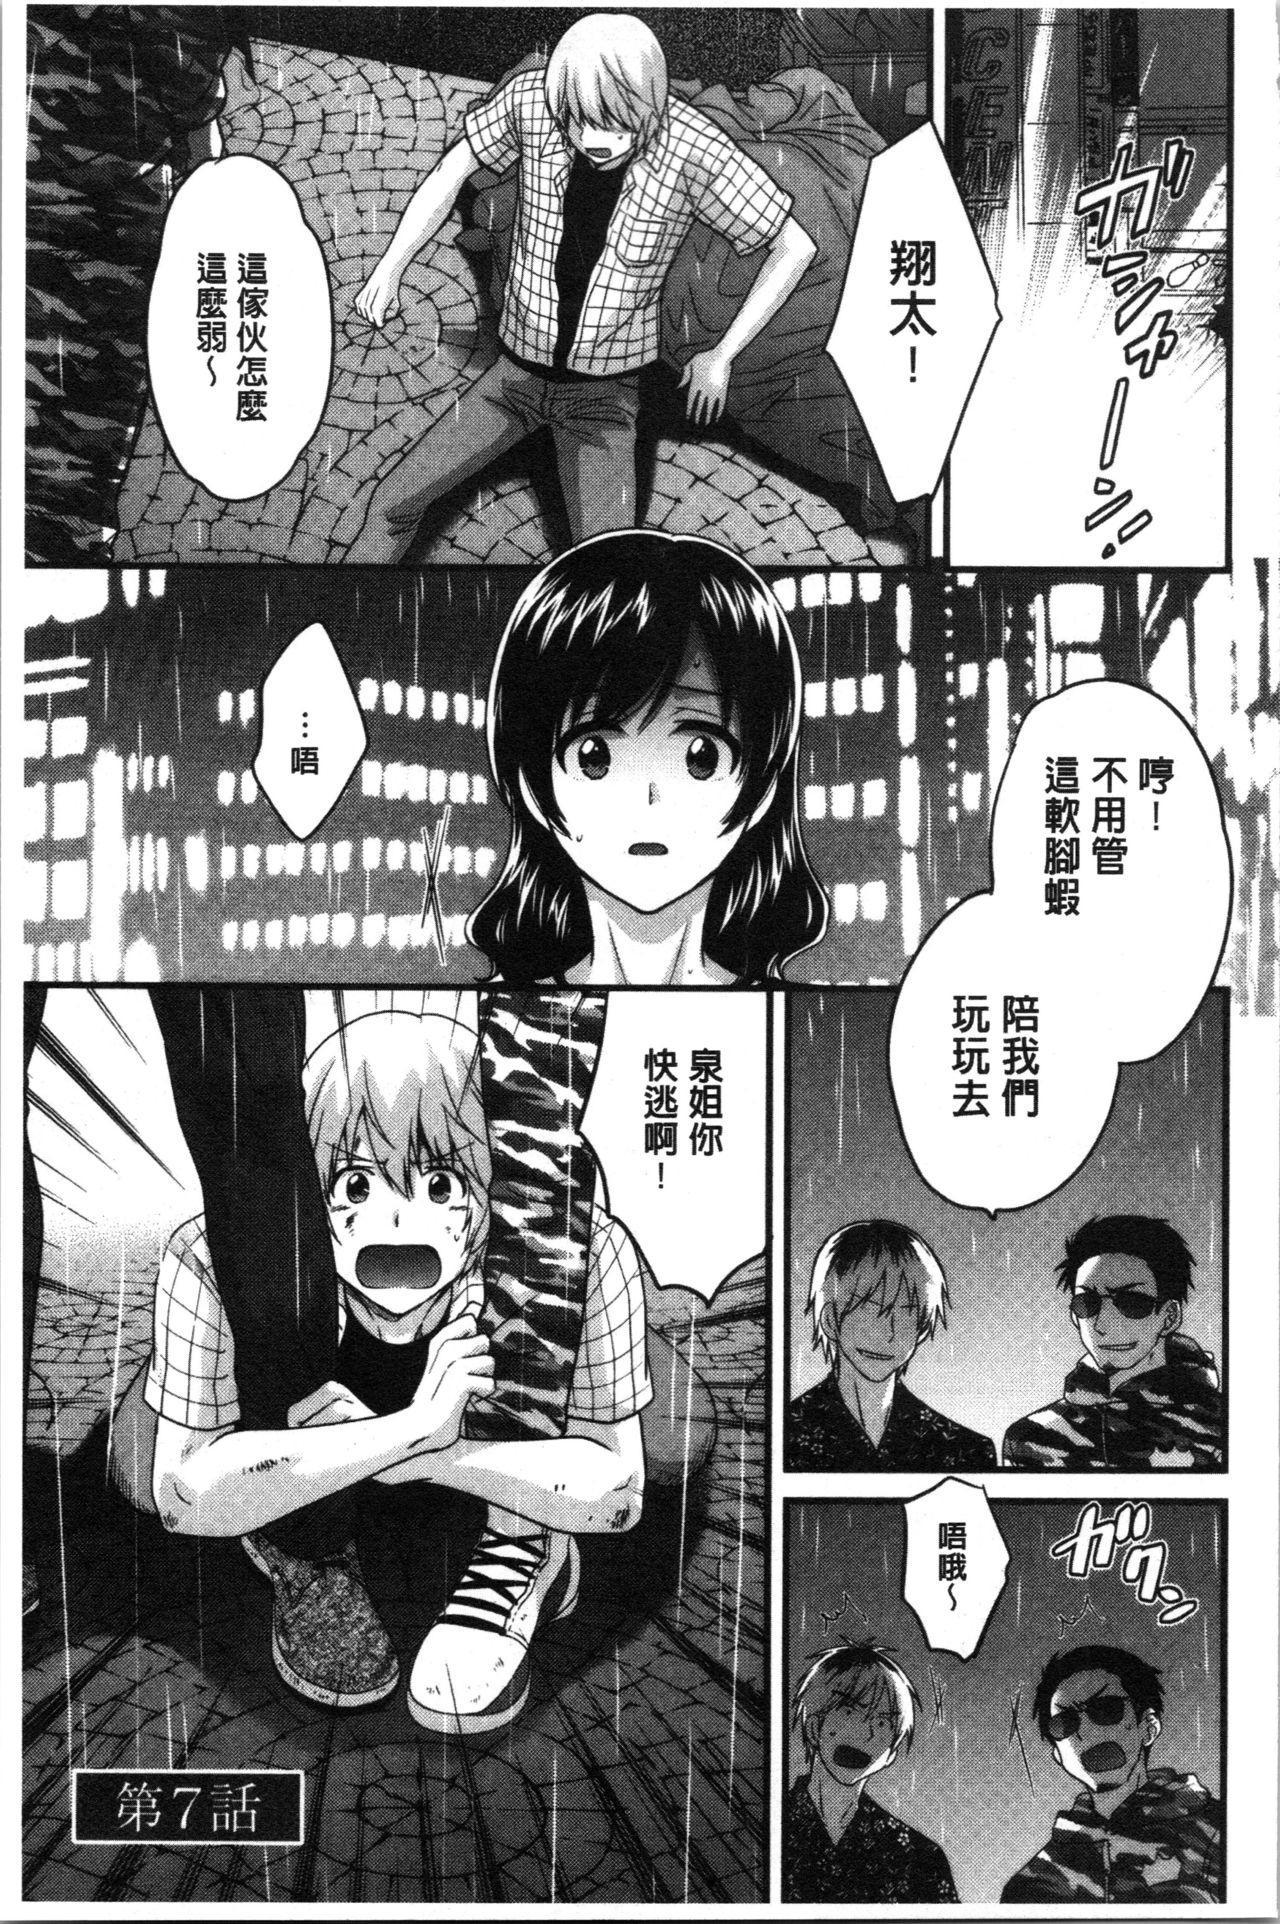 Ottori Midarana Mikami-san   嫻淑優雅又淫亂的三上小姐 116